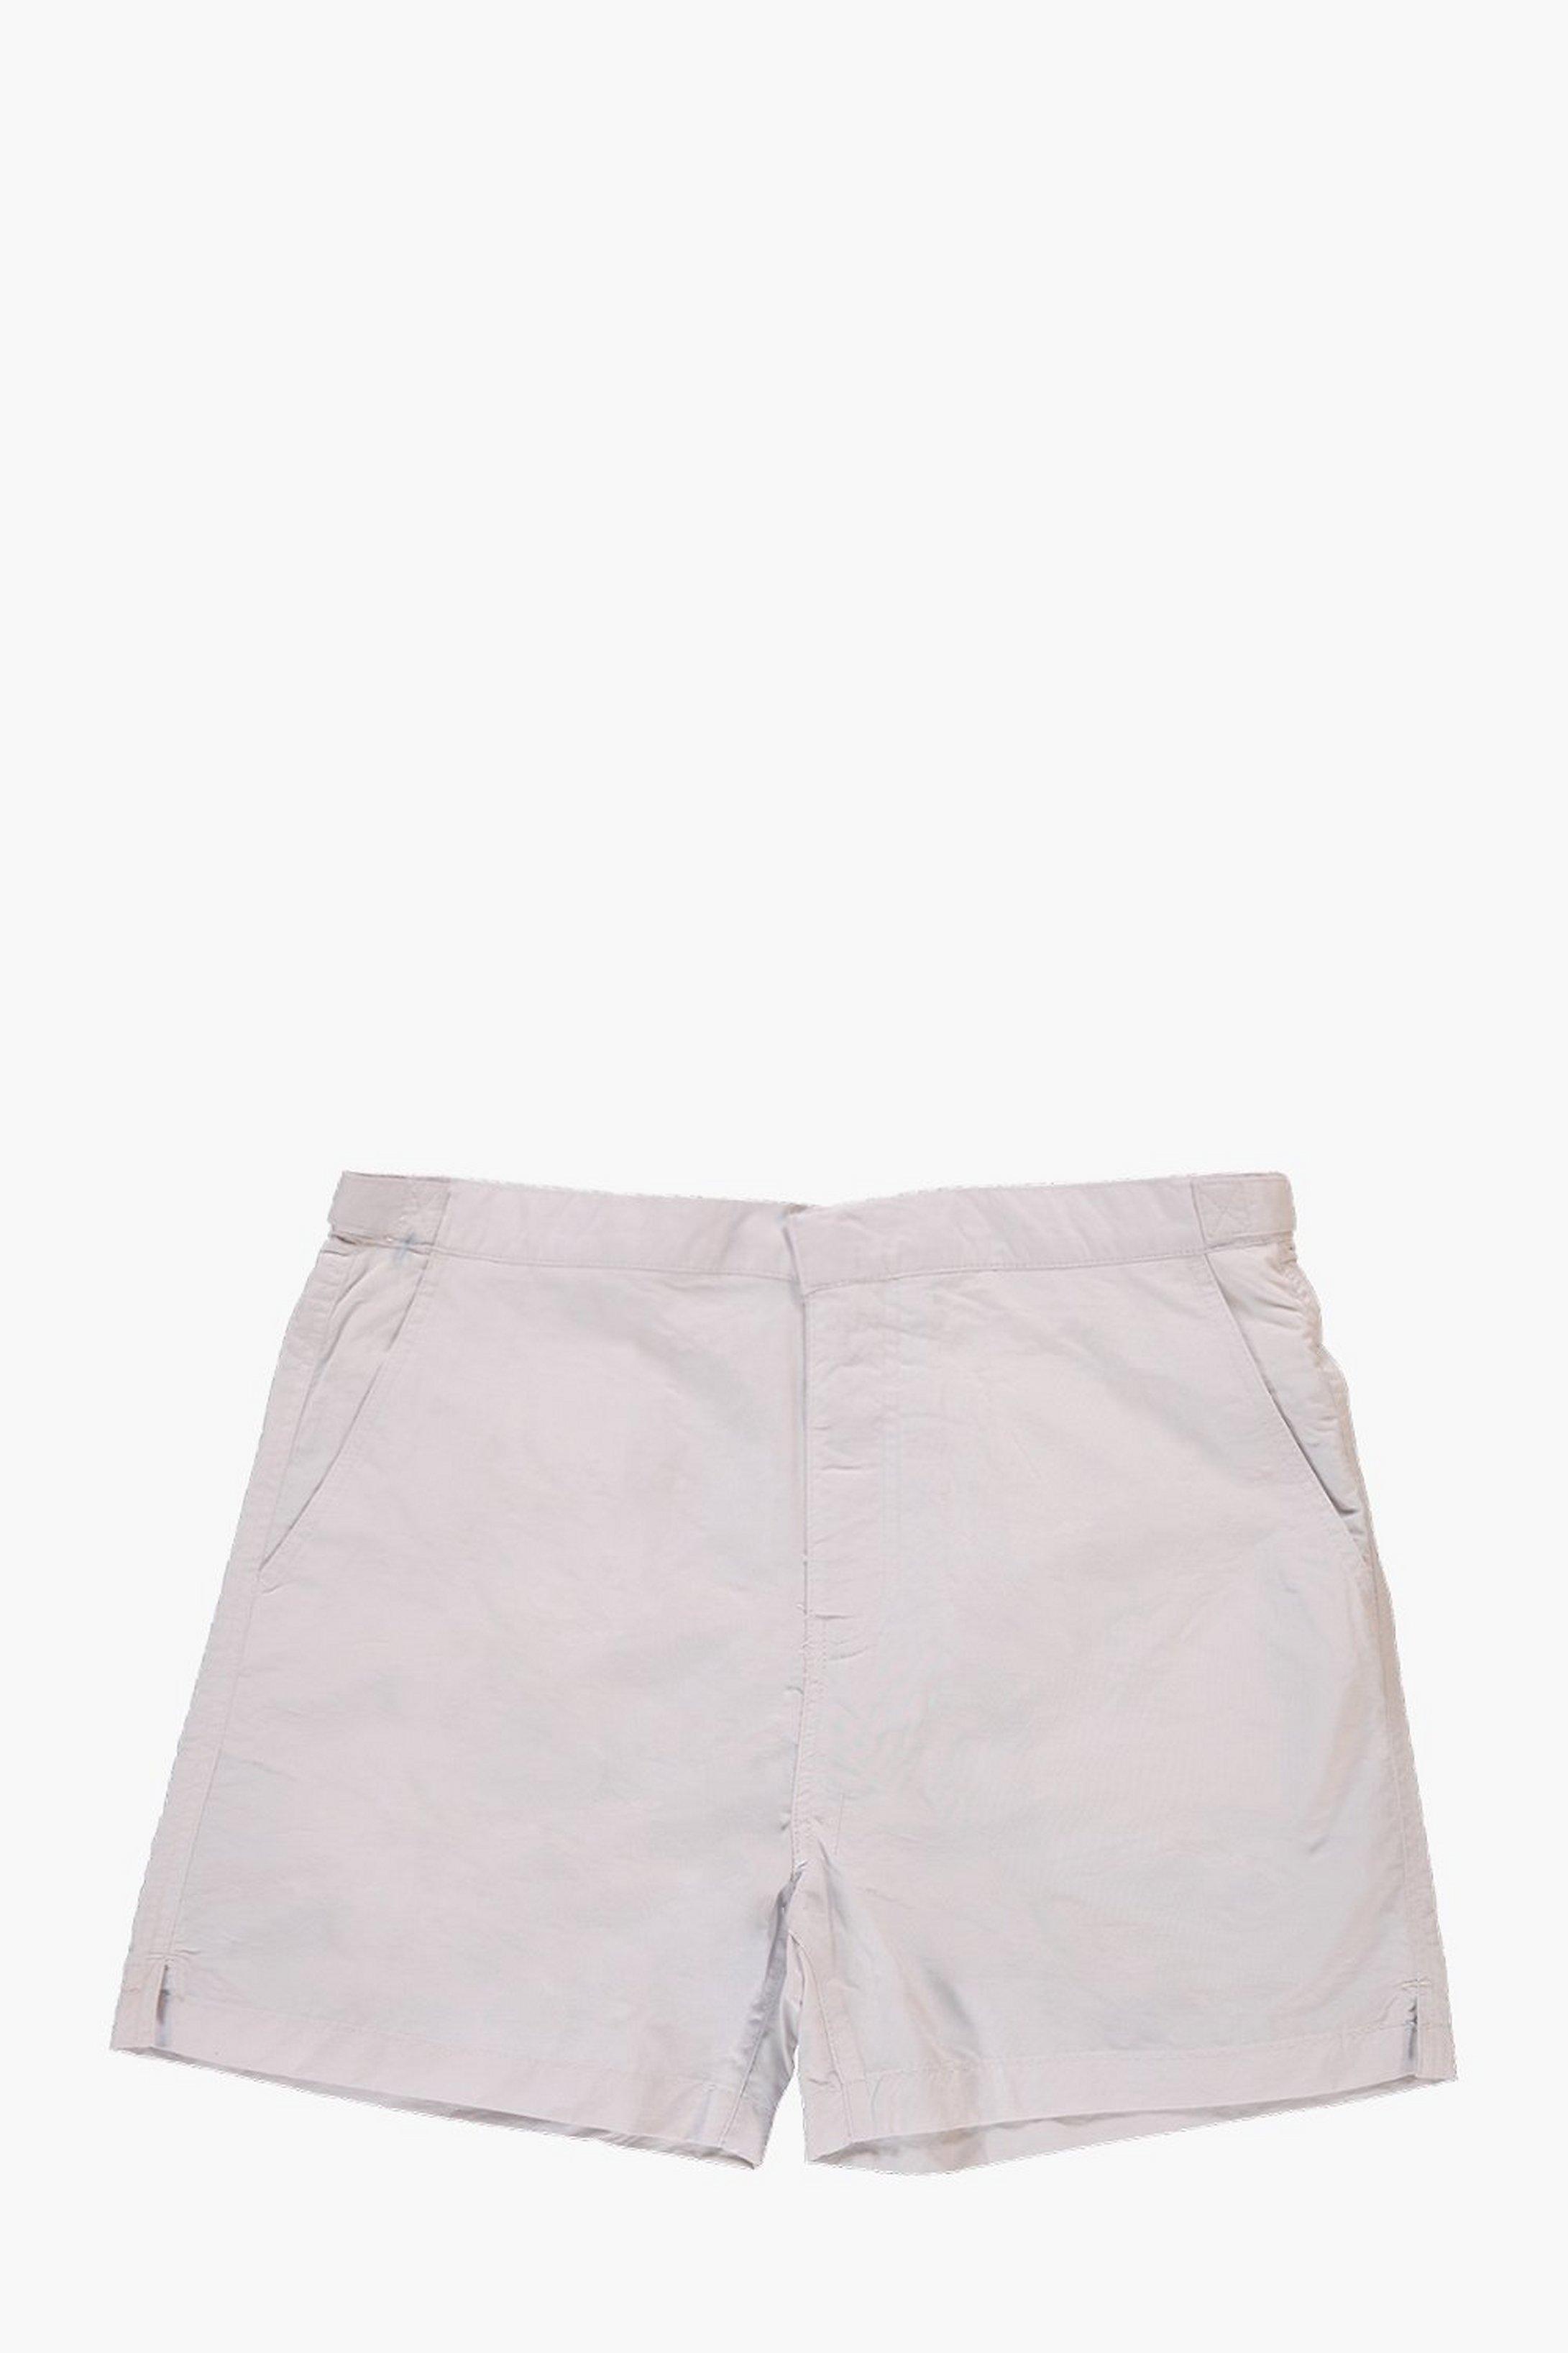 c39c0f6e79 Smart Taslan Swim Shorts | Boohoo